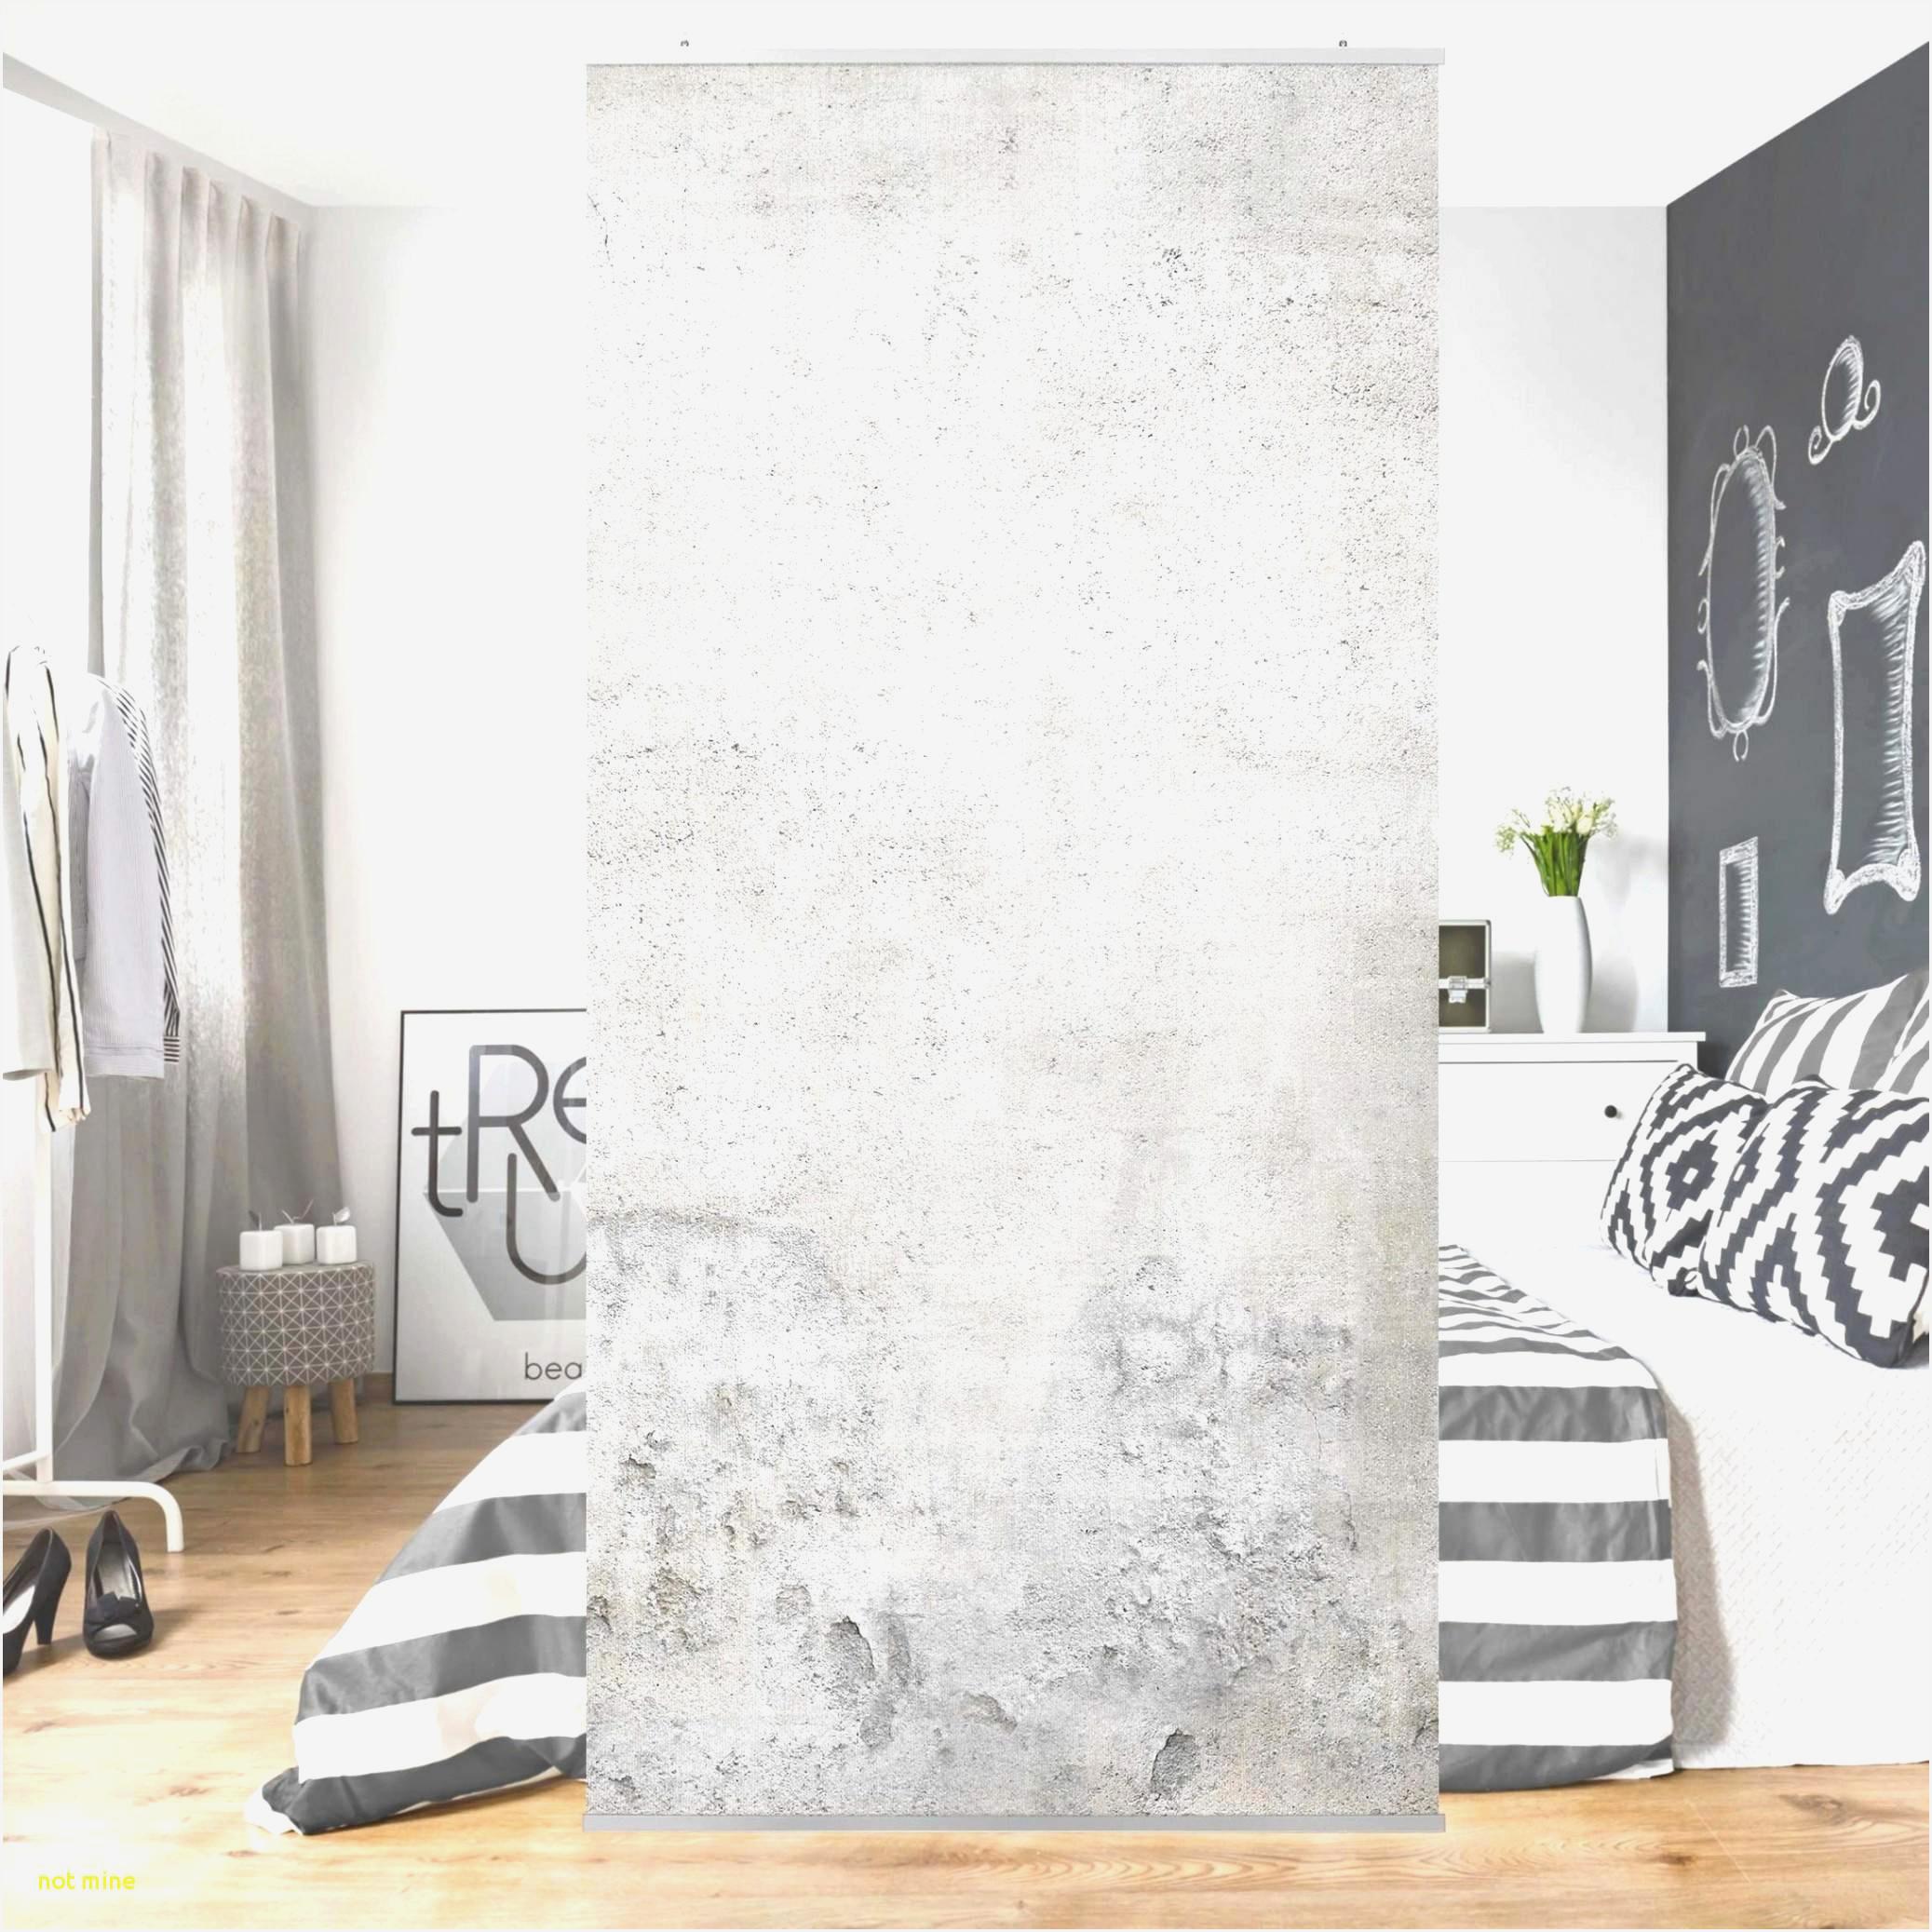 wohnzimmer wand grau ideen